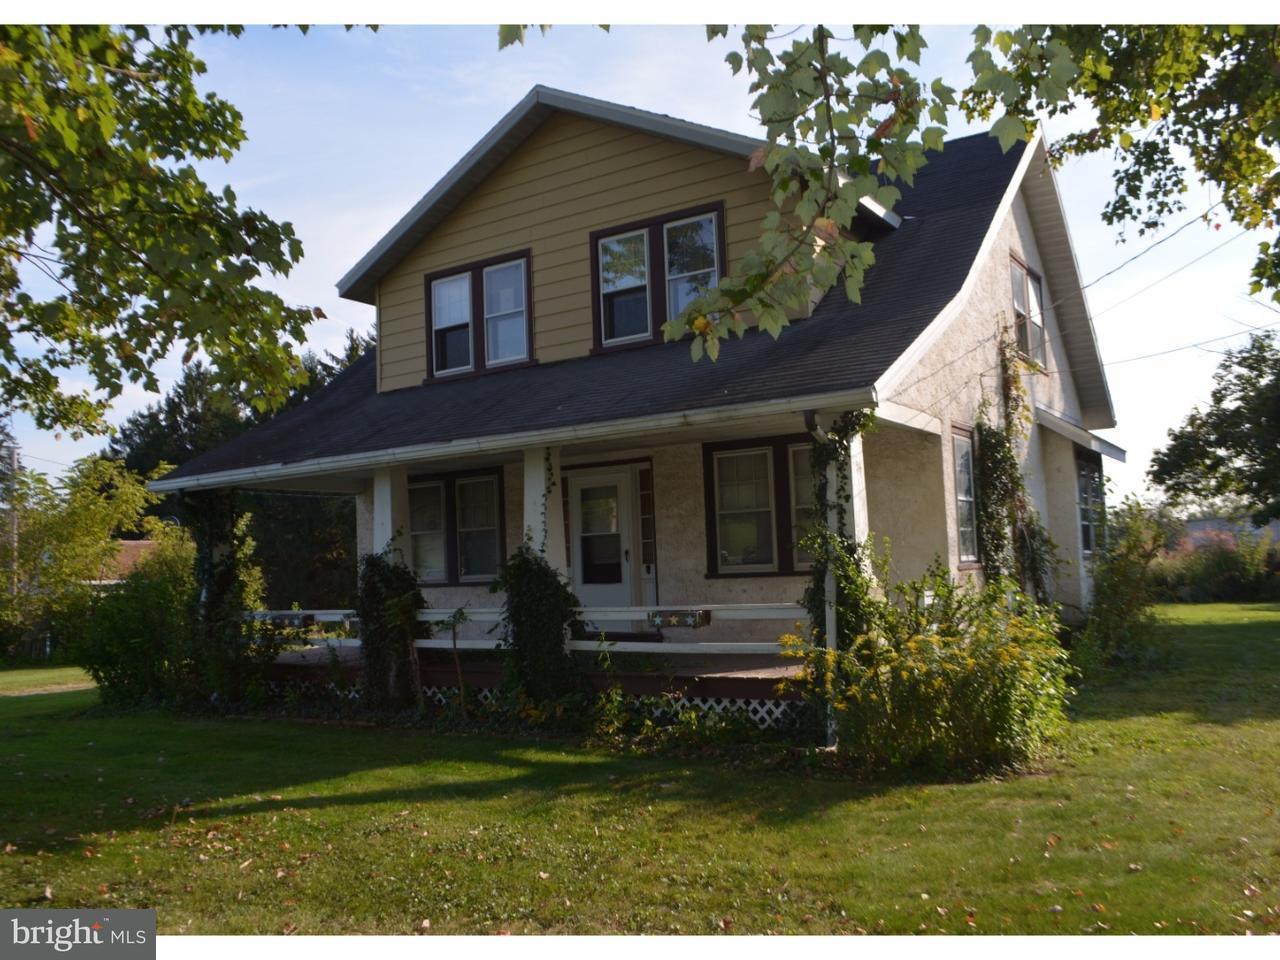 Casa Unifamiliar por un Alquiler en 2102 POTTSTOWN PIKE Pottstown, Pennsylvania 19465 Estados Unidos